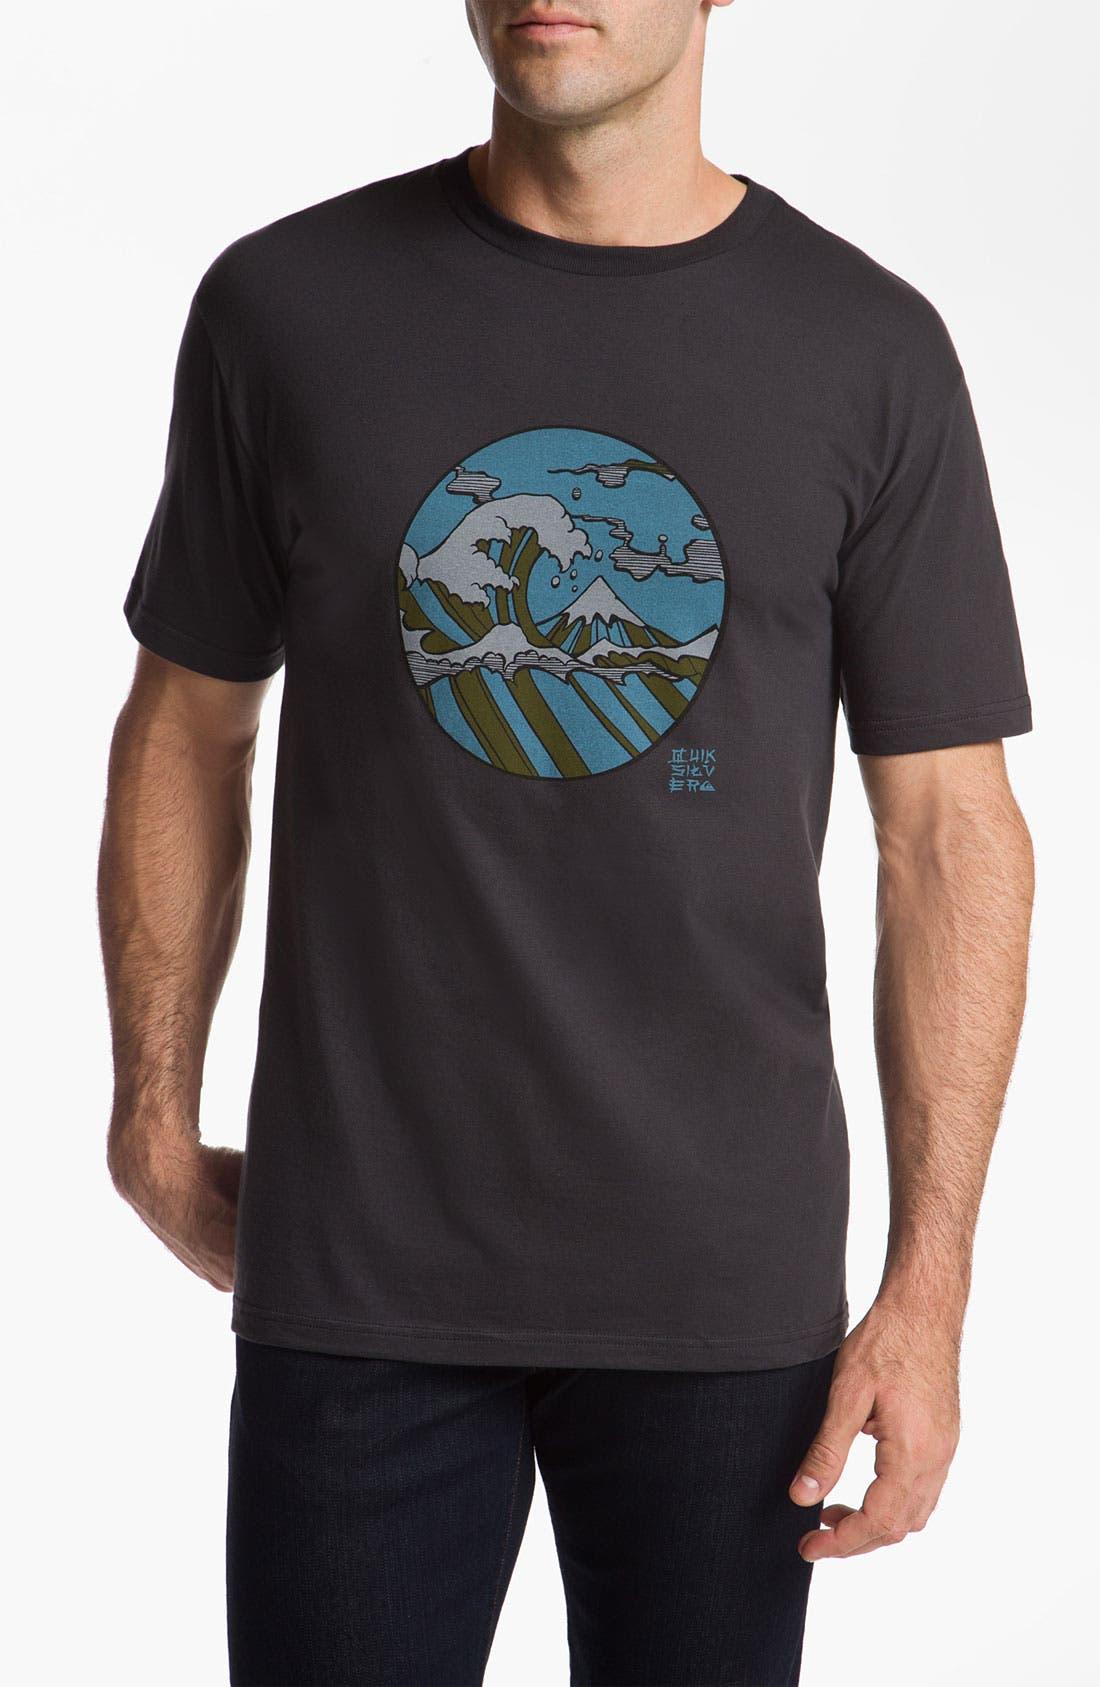 Alternate Image 1 Selected - Quiksilver 'Chiba' T-Shirt